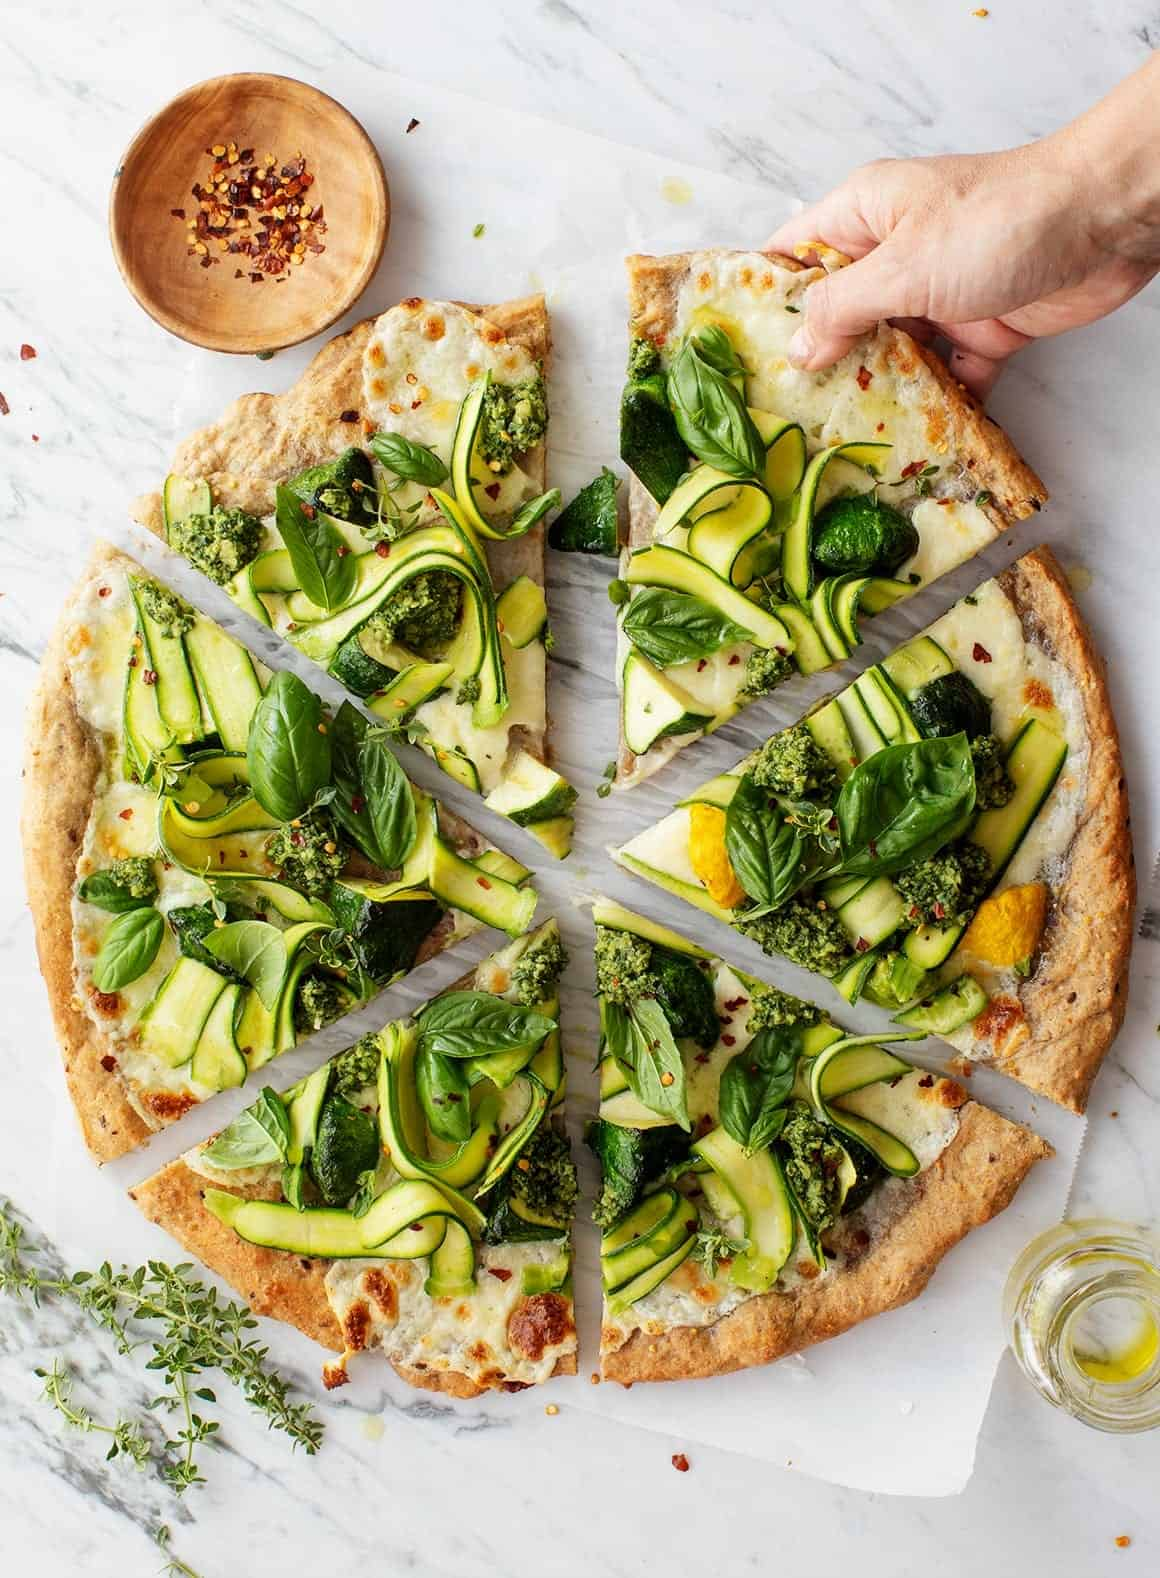 Basil pizza